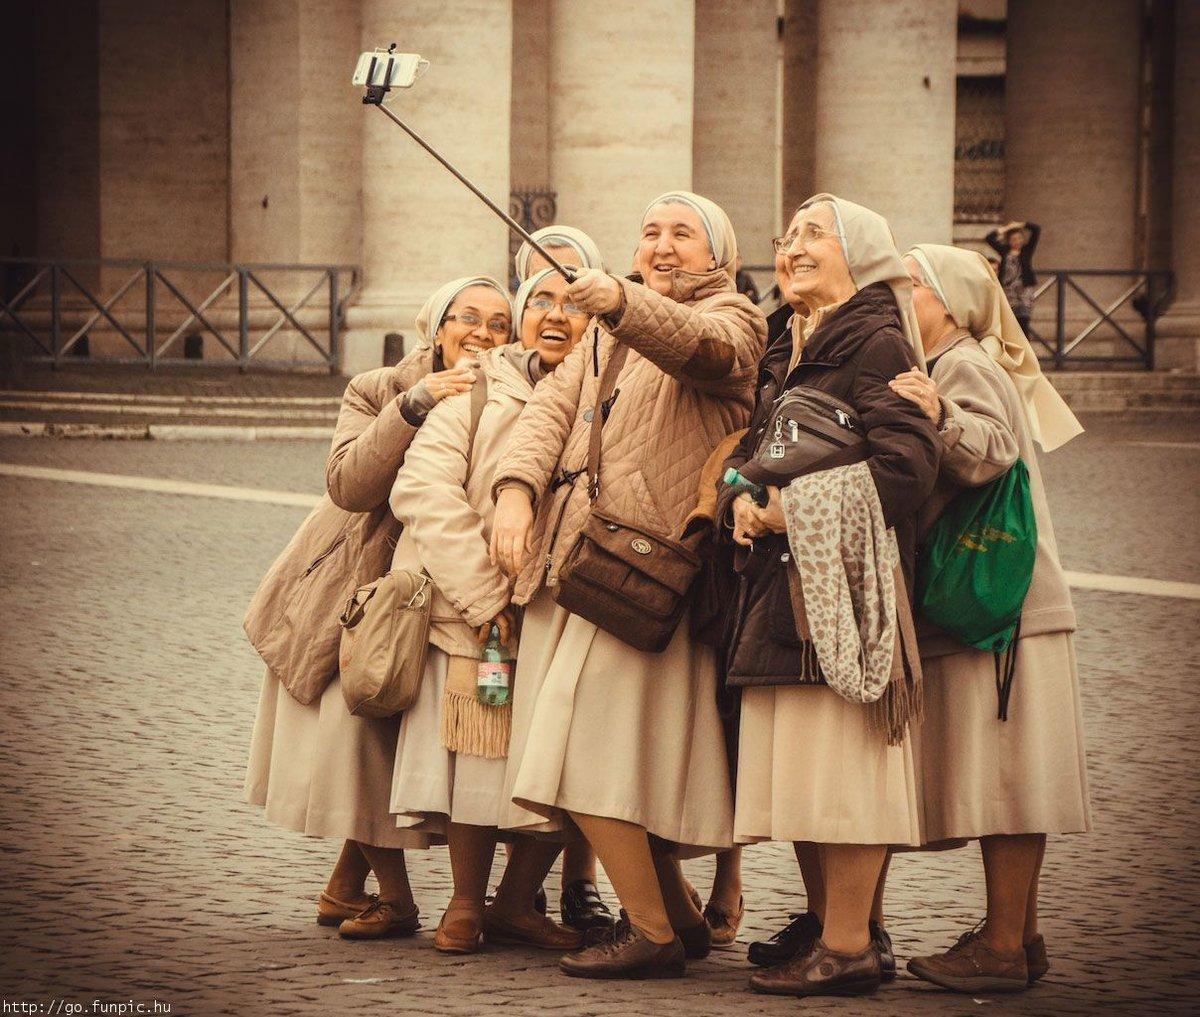 Картинки старушки веселятся